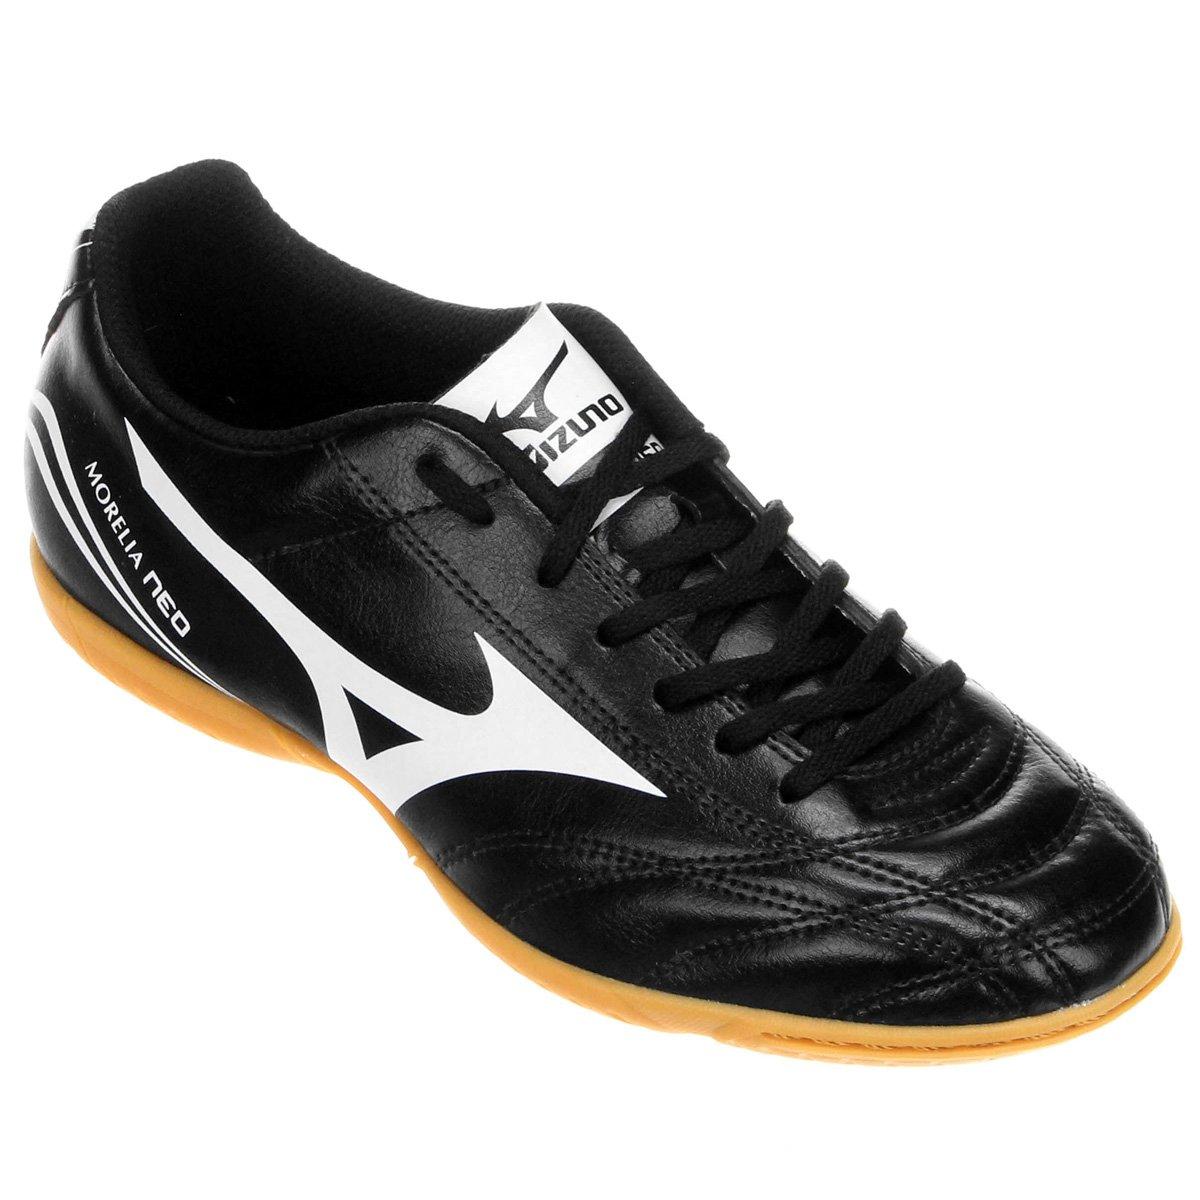 1fae1253a ... czech netshoes futebol futebol futebol mizuno para para futebol  netshoes mizuno chuteiras netshoes para para chuteiras